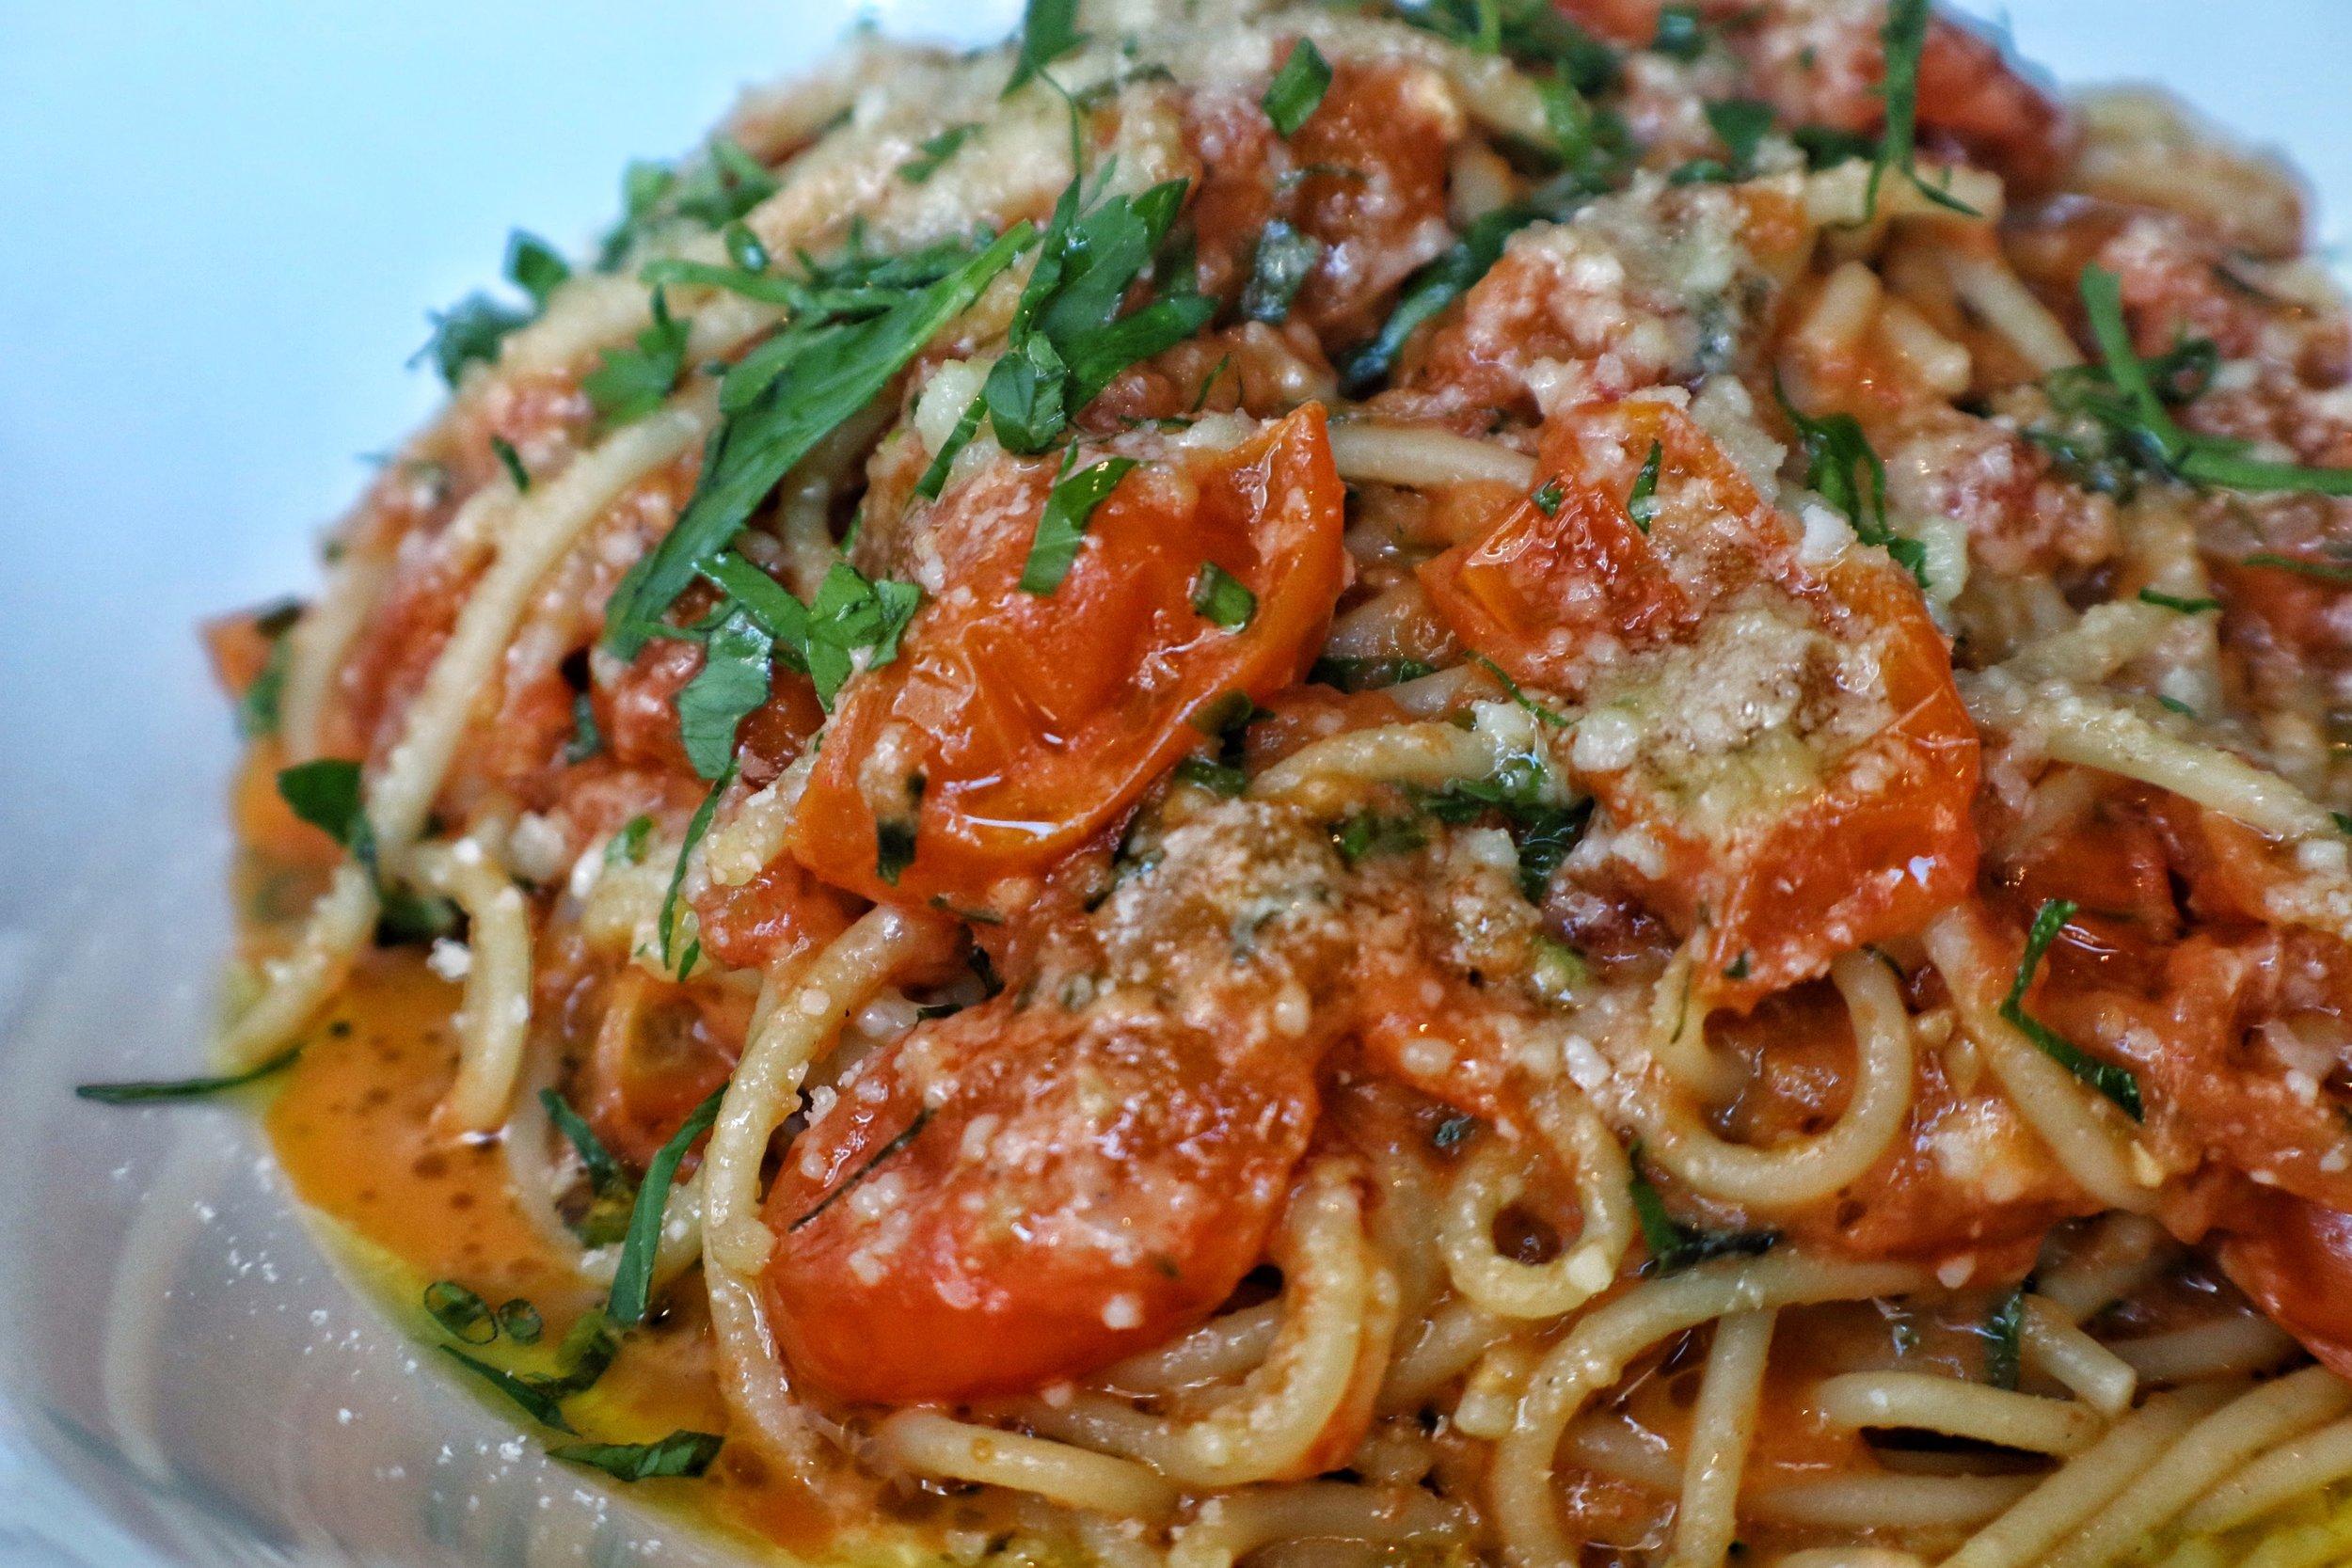 spaghettini, san marzano tomato sauce, basil, parmigiano reggiano